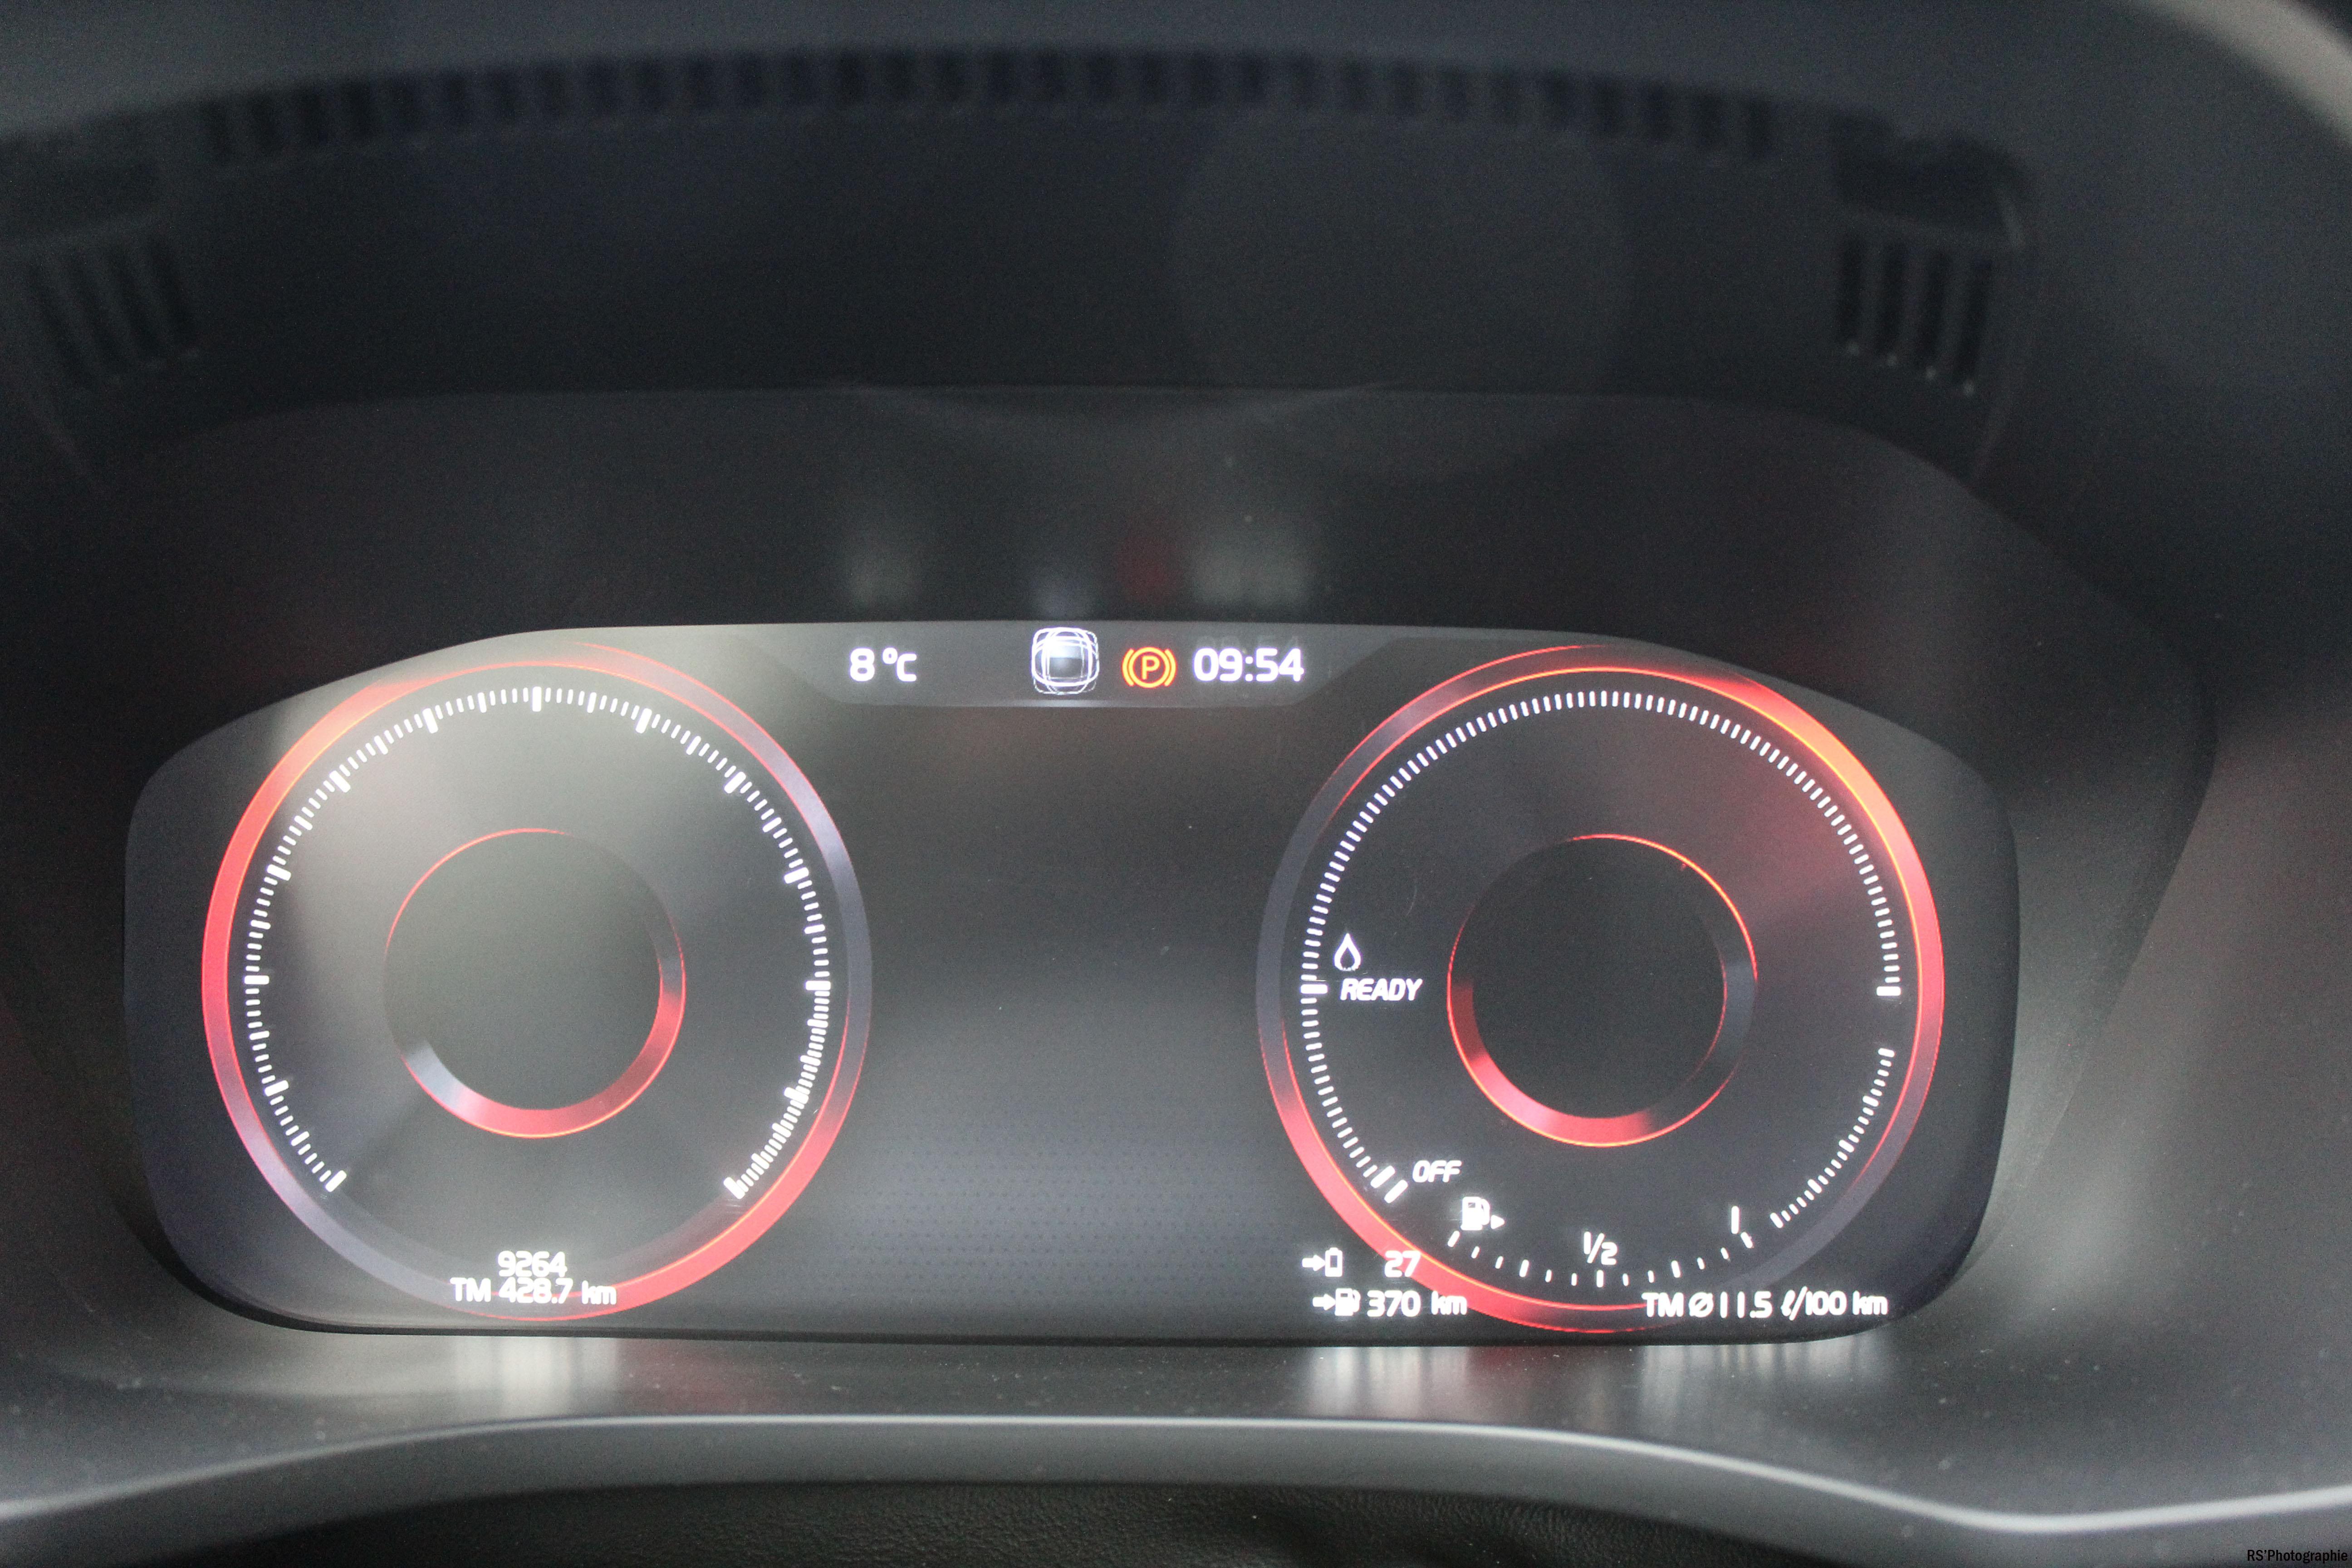 volvoXC6033-volvo-XC60-T8-Hybrid-intérieur-onboard-Arnaud Demasier-RSPhotographie